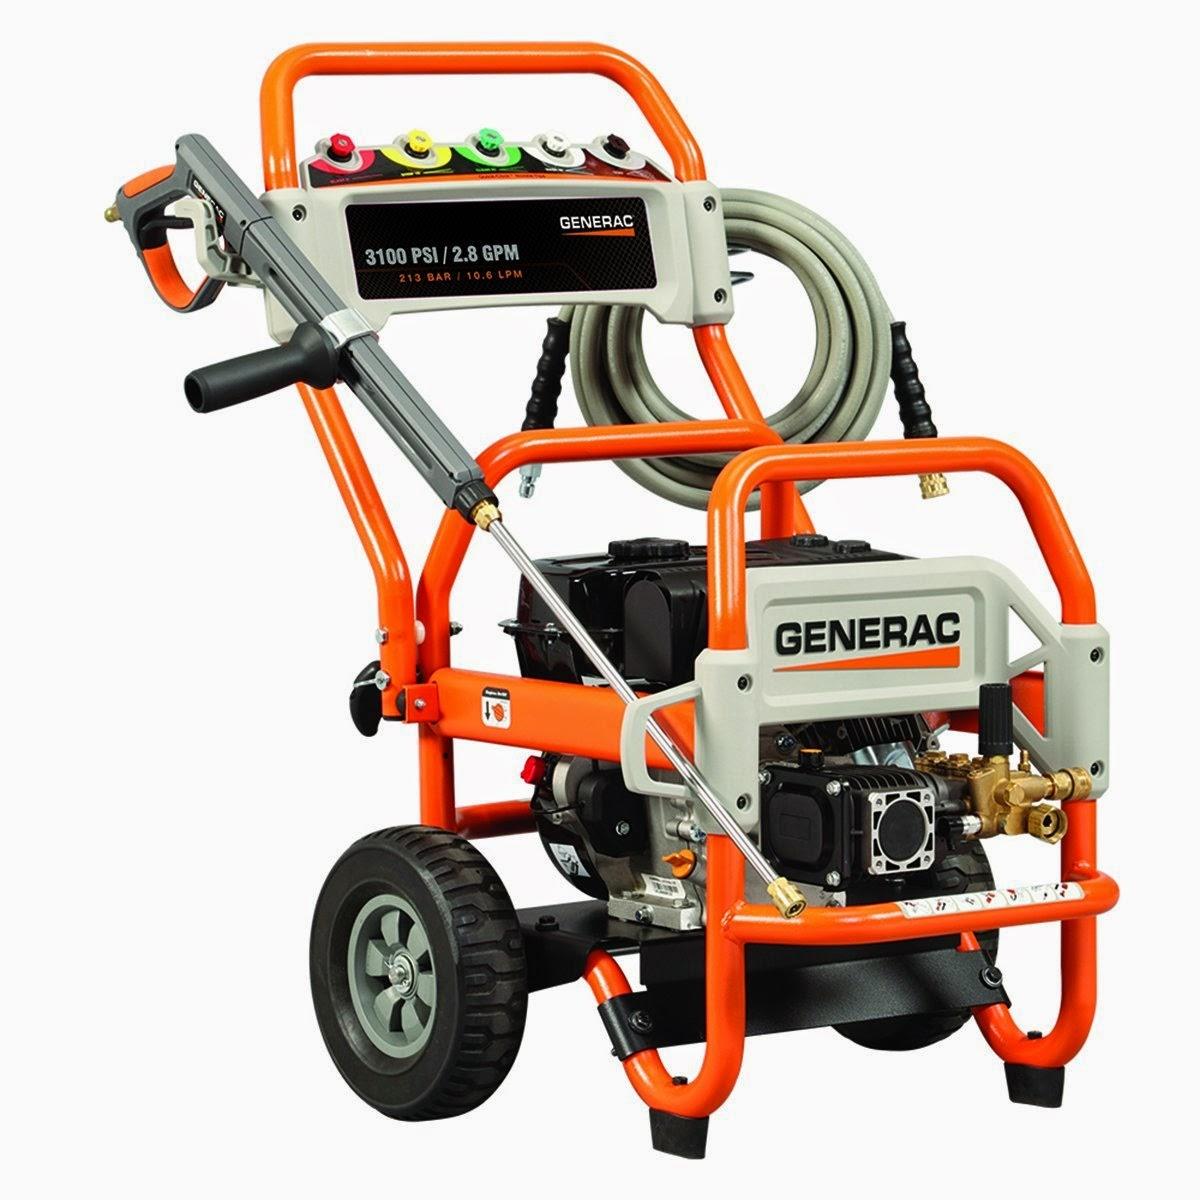 generac power washer: generac gas power washer